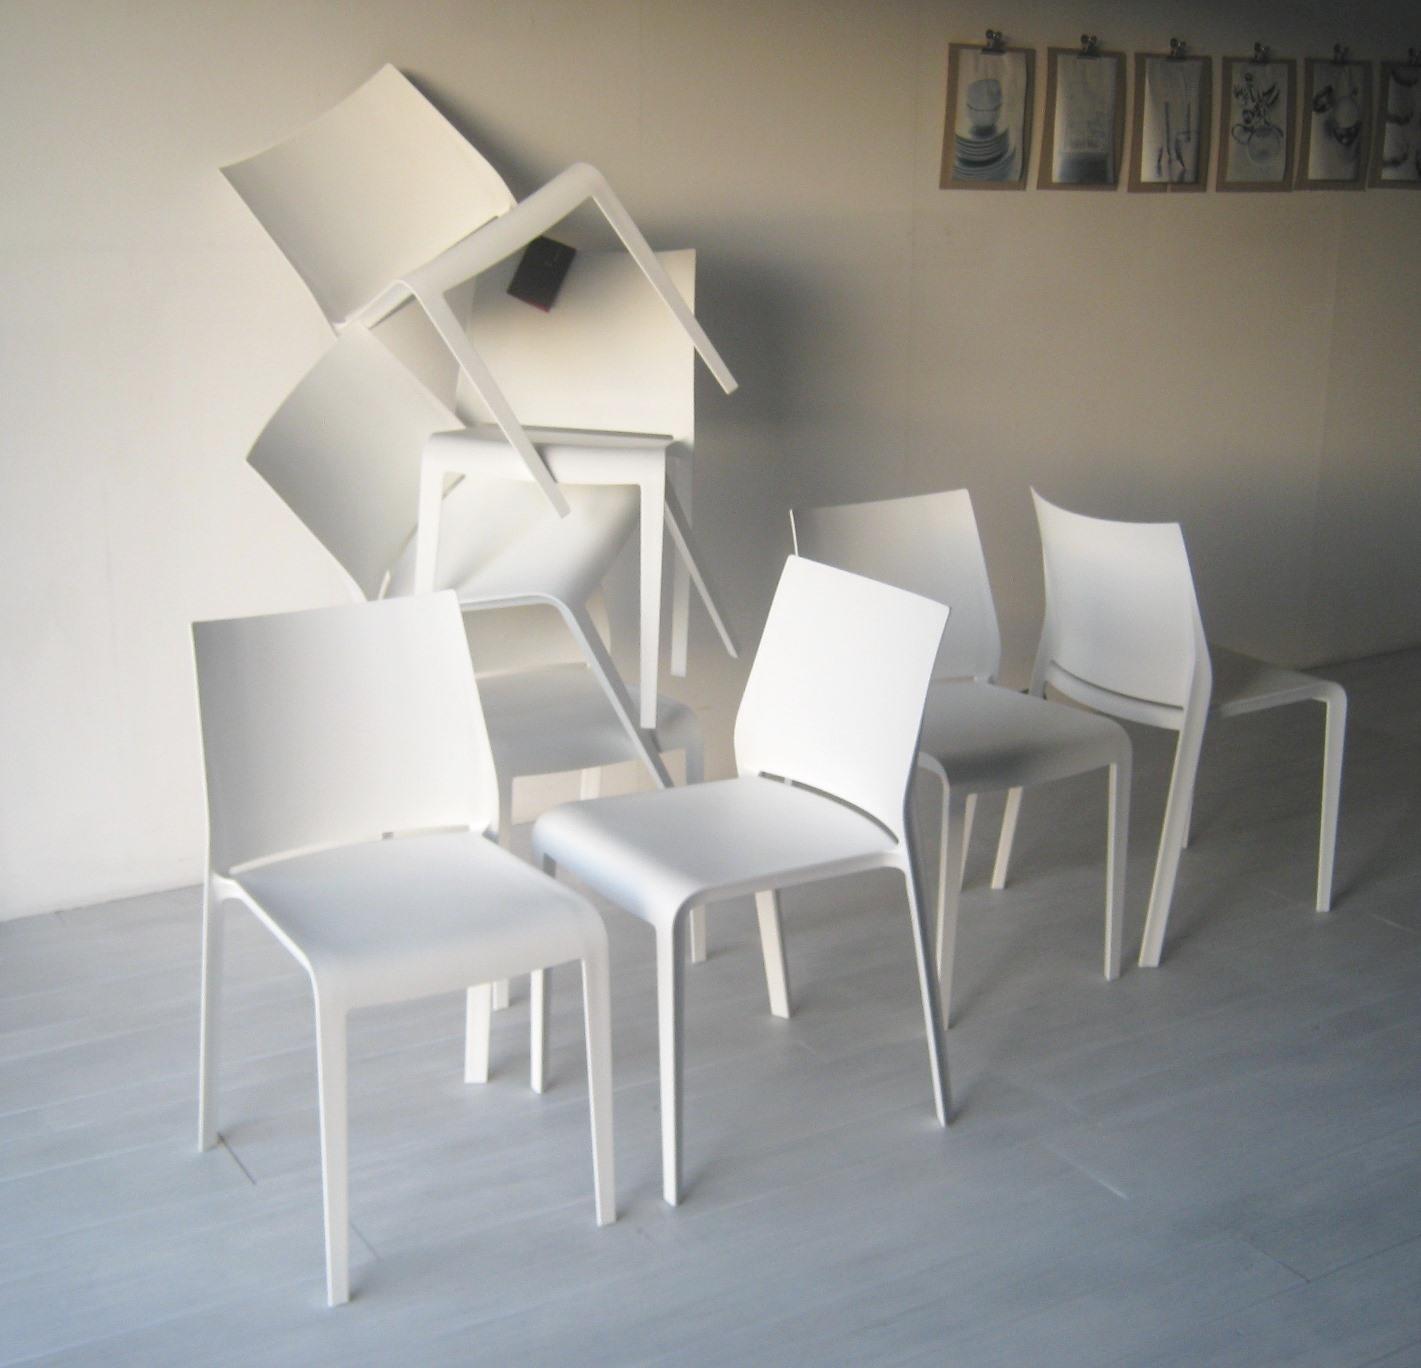 Sedia desalto set 4 sedie riga impilabili desalto outlet for Sedie design outlet